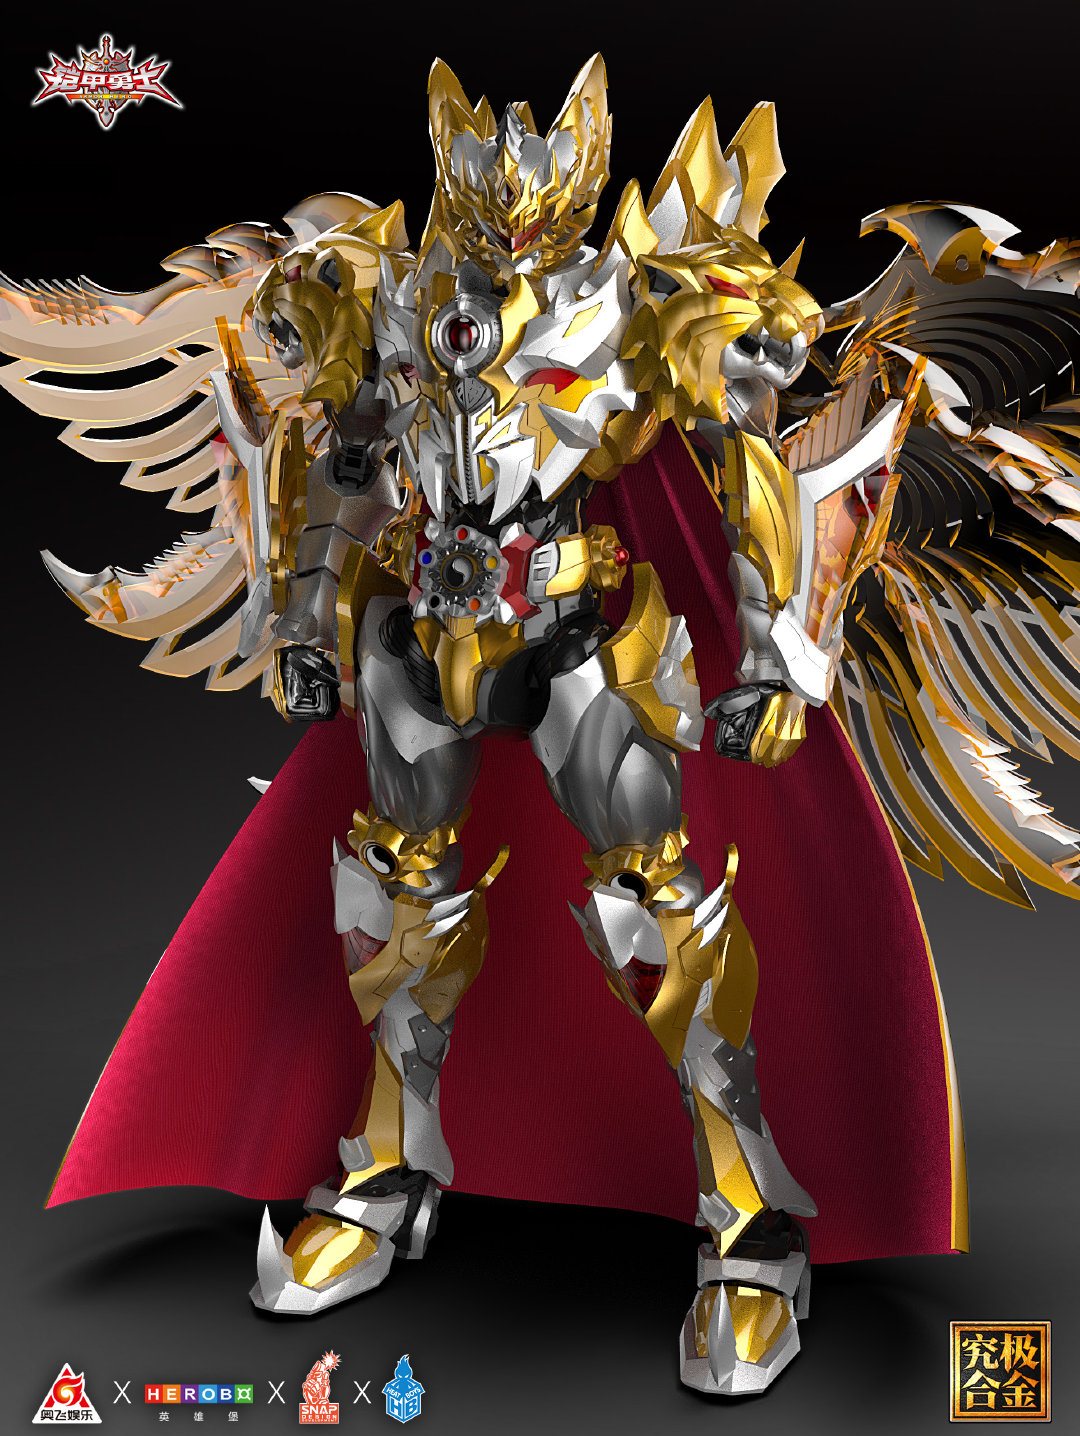 S535_Armor_hero_Emperor_034.jpg